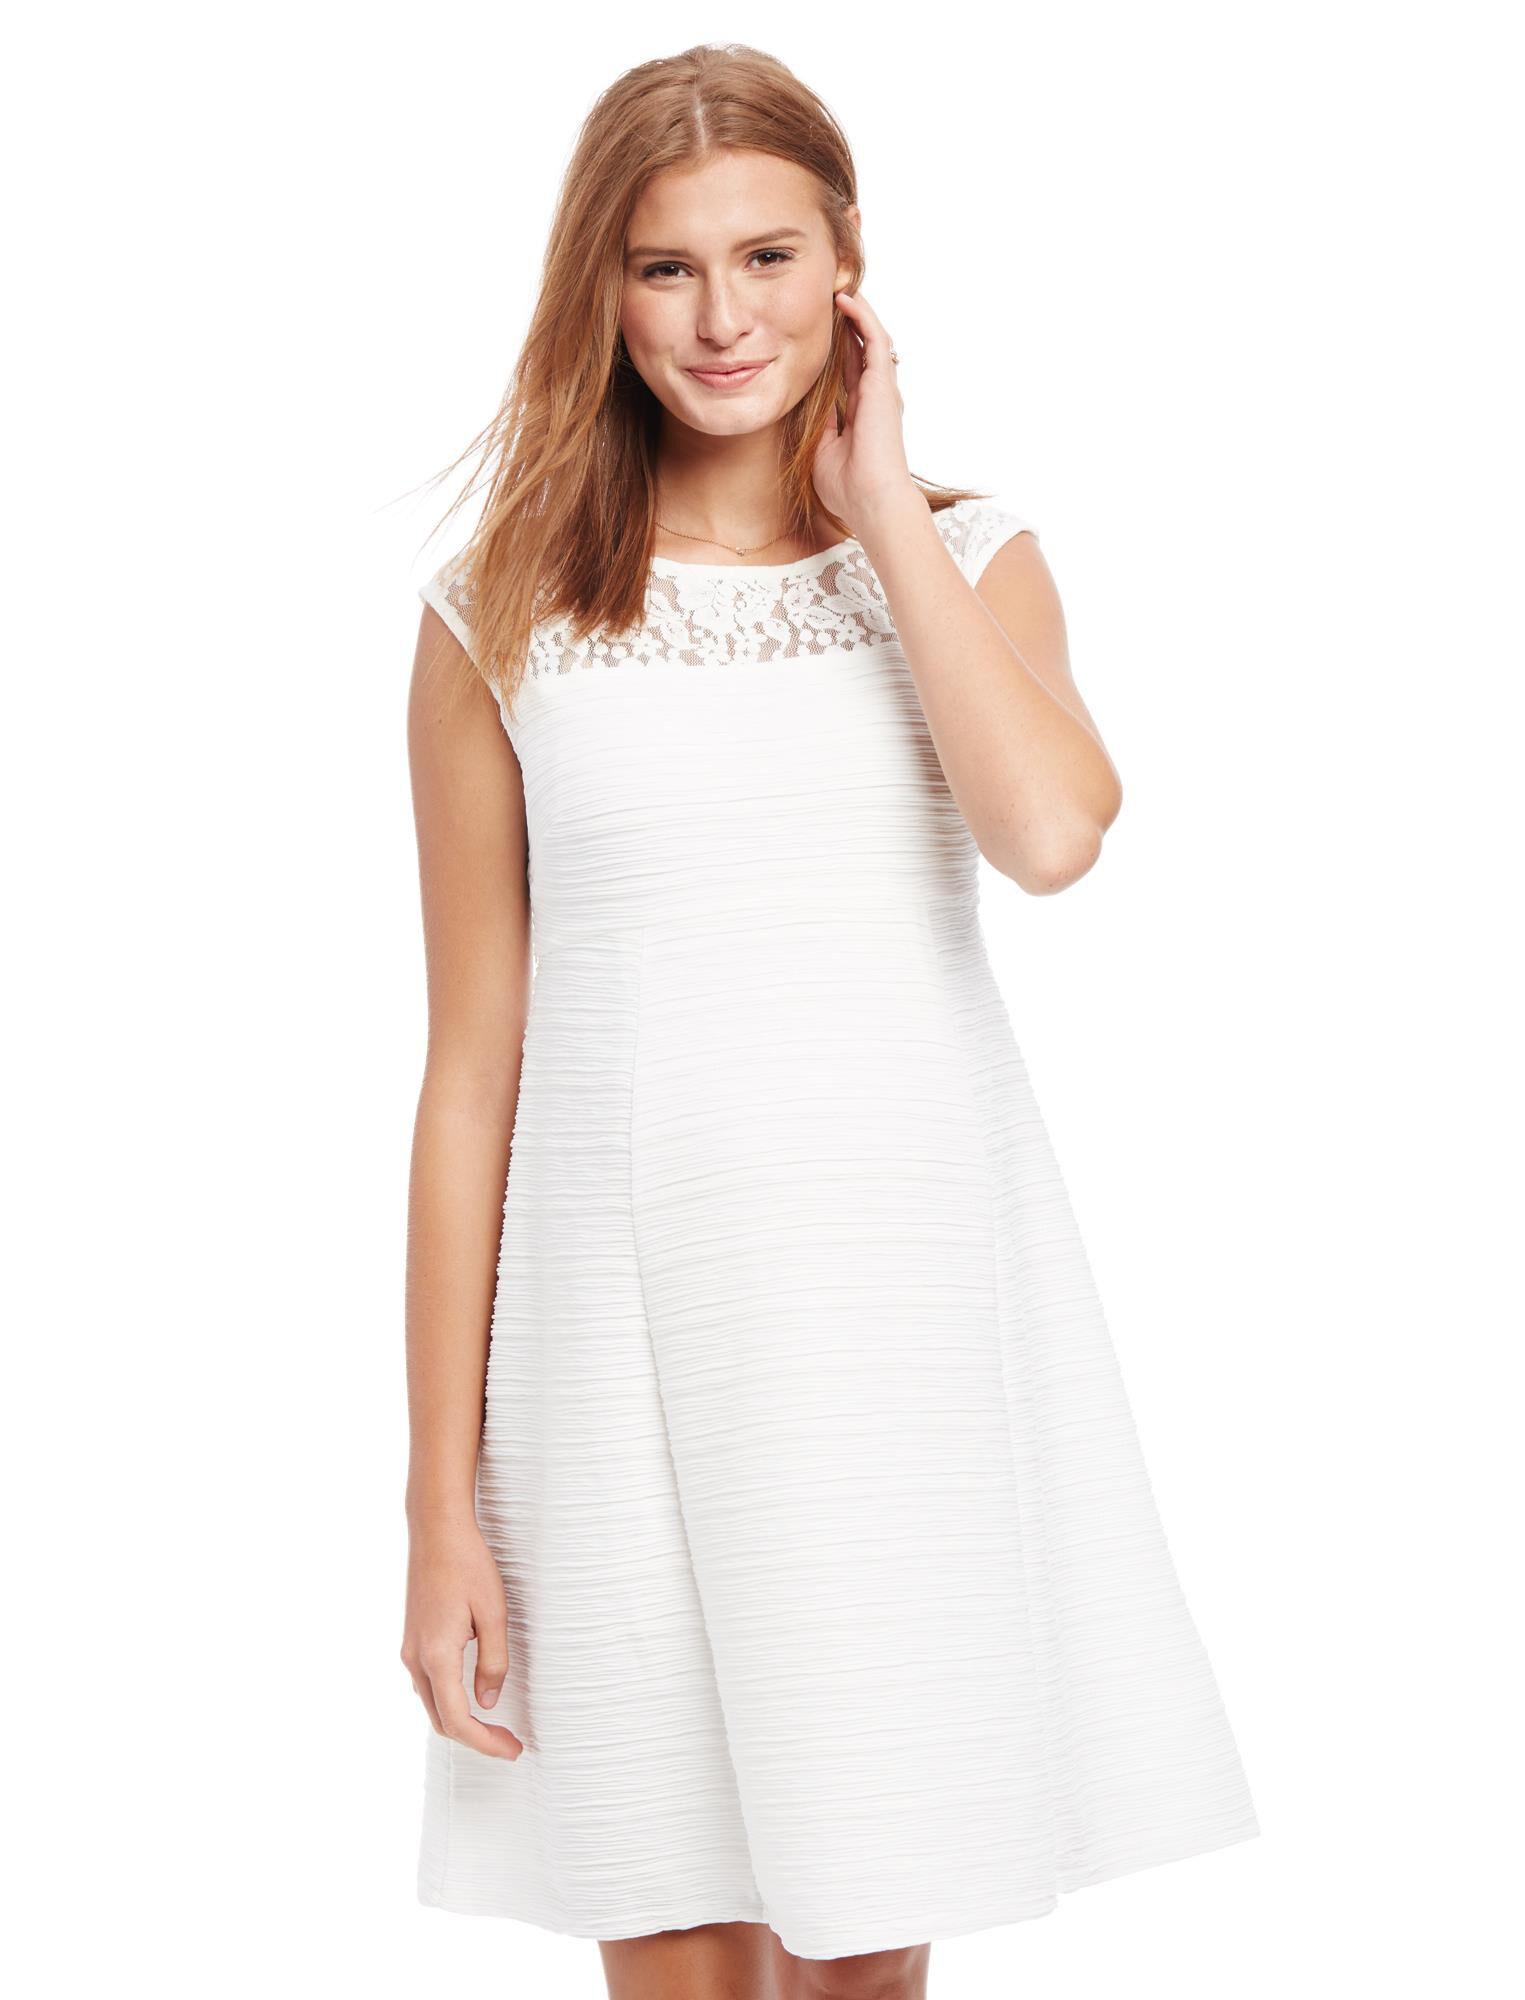 Lace Detail Maternity Dress